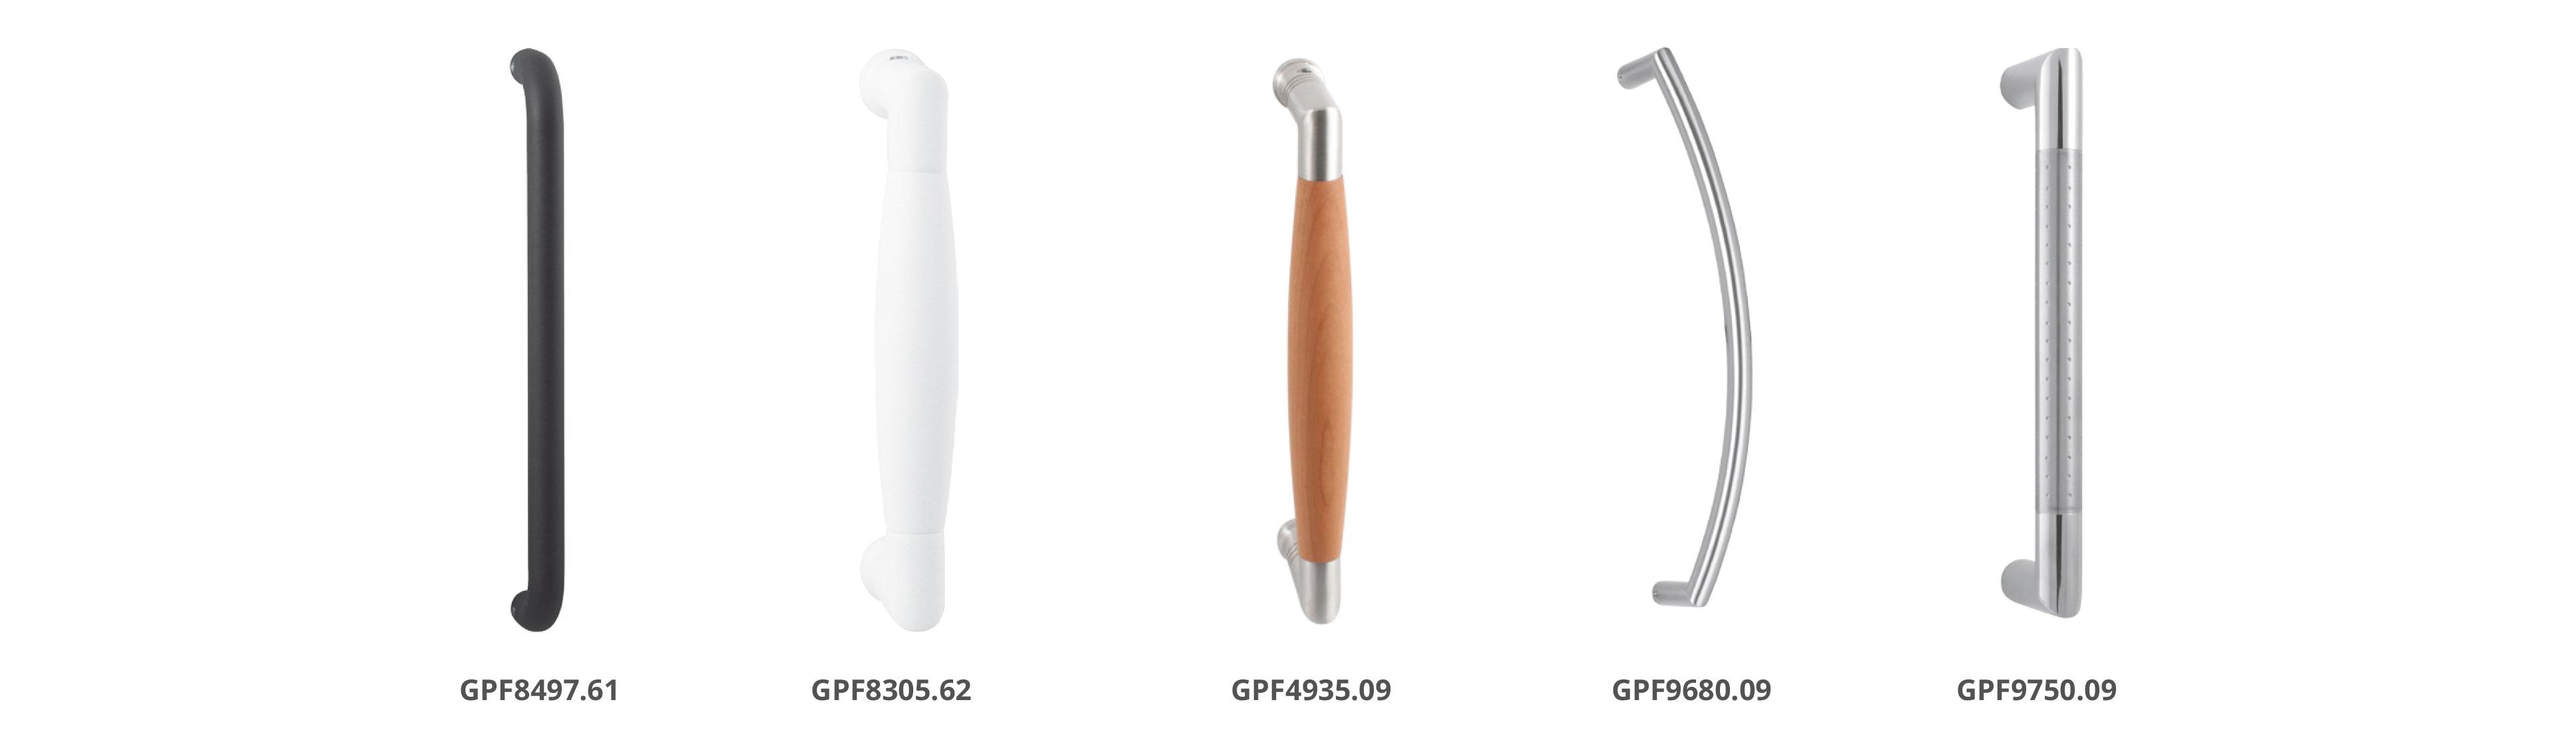 GPF Grepen in verschillende vormen en finishes